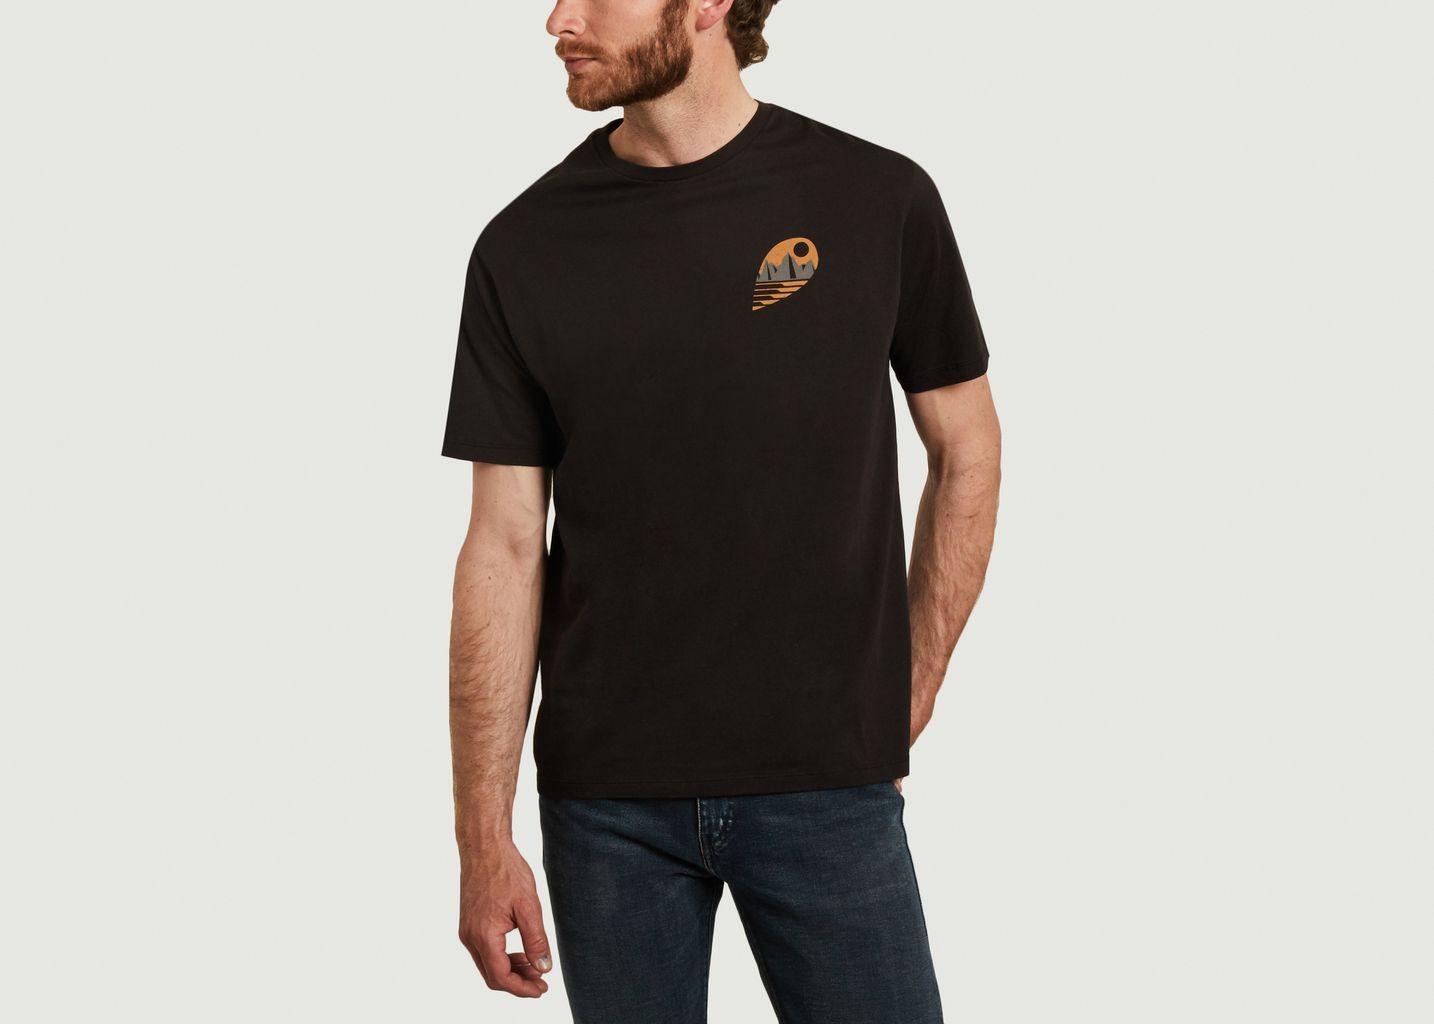 T-shirt Tube View - Patagonia